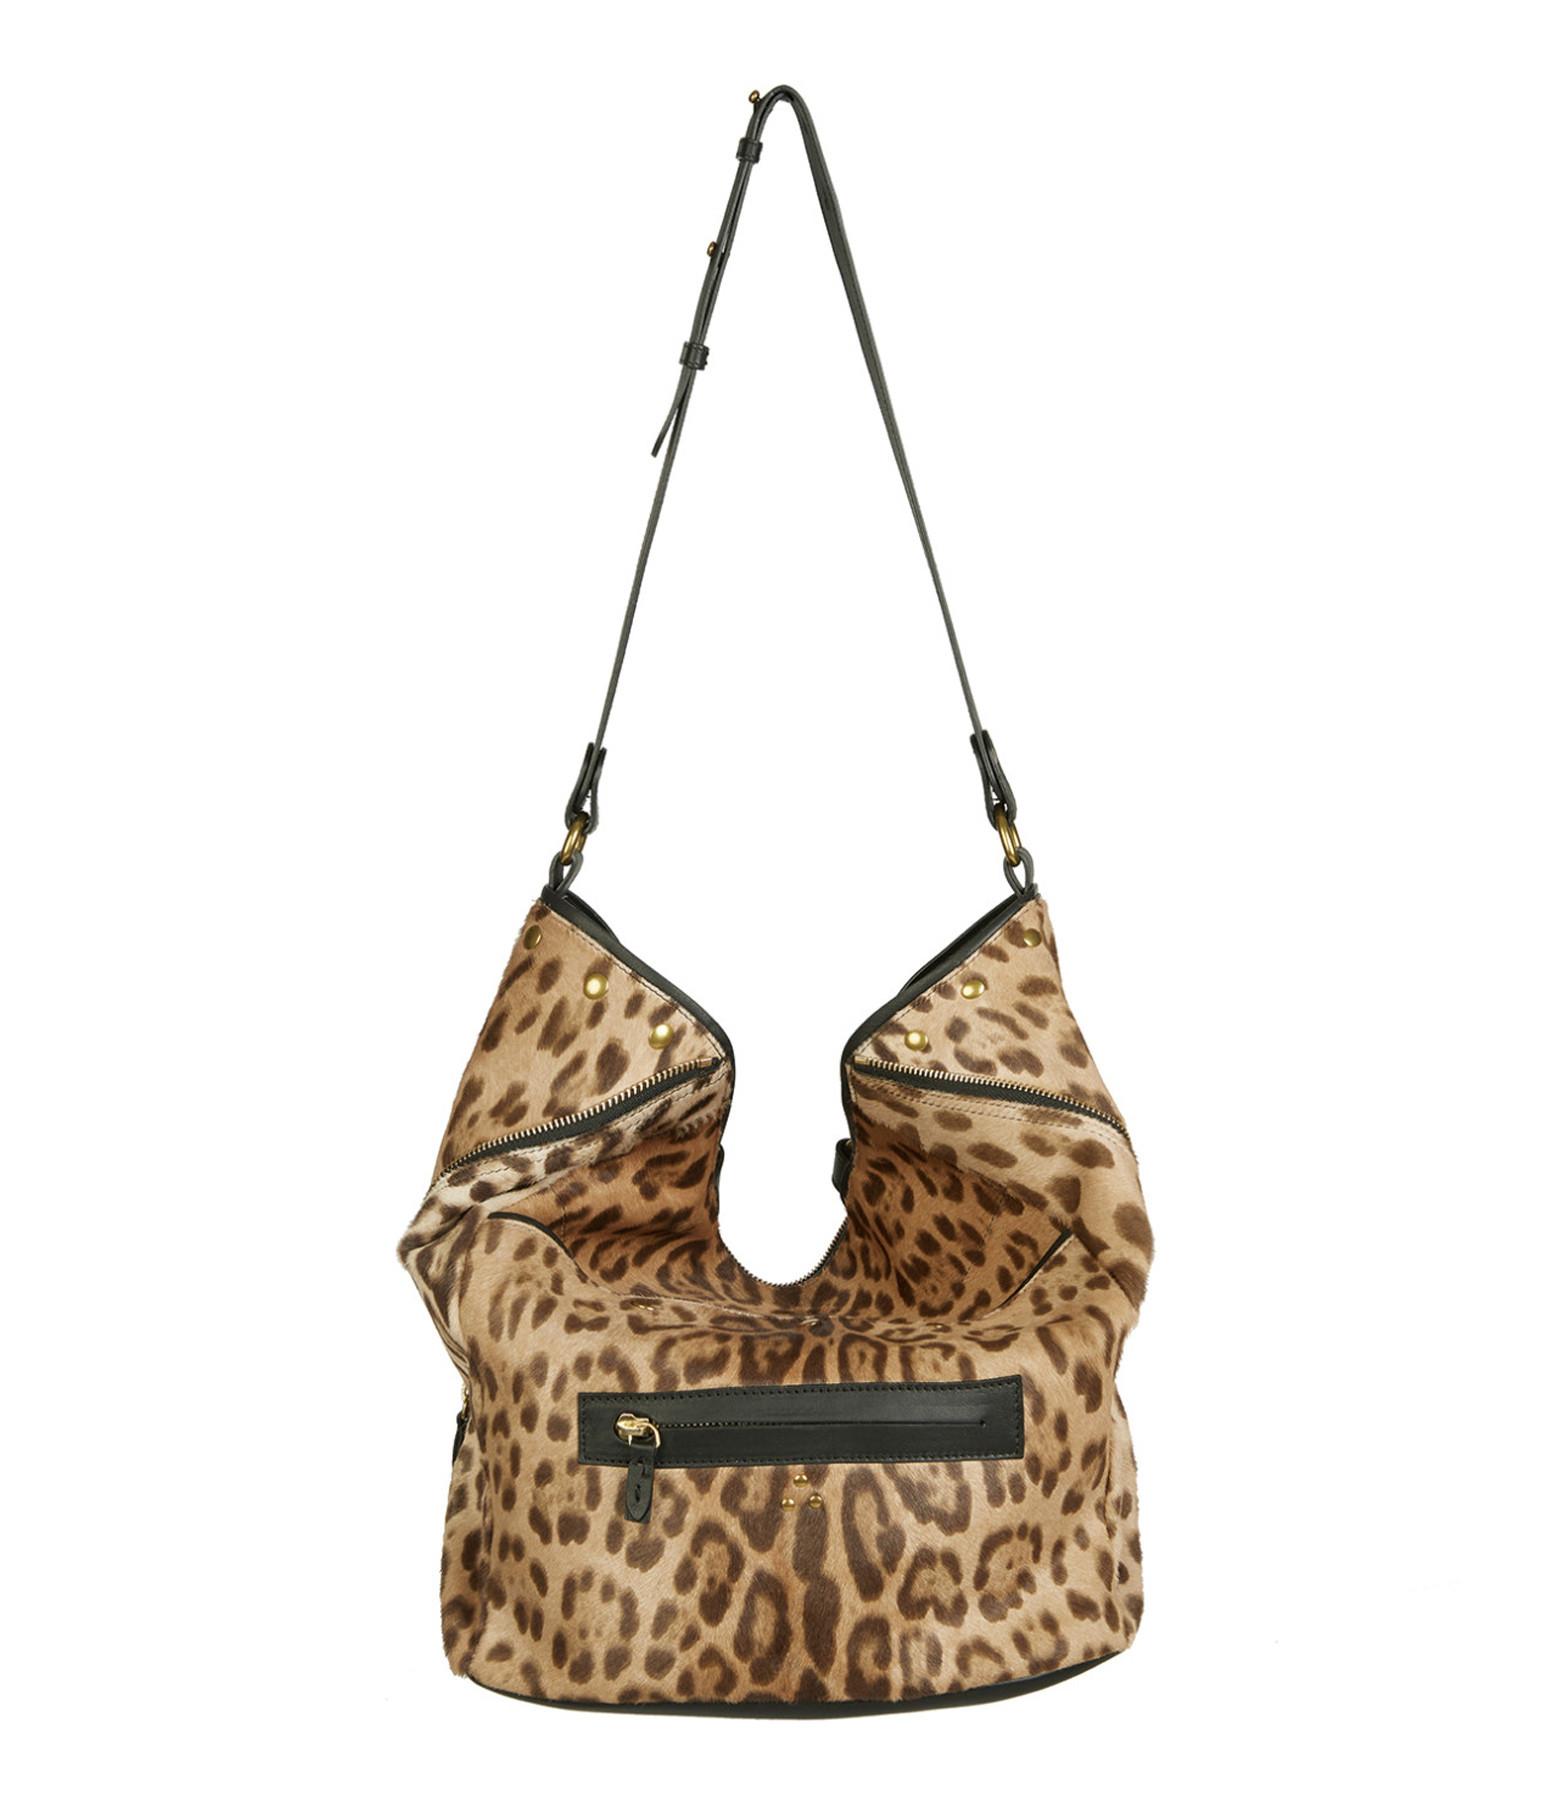 JEROME DREYFUSS - Sac Serge Veau Agneau Chèvre Leopard Sauvage